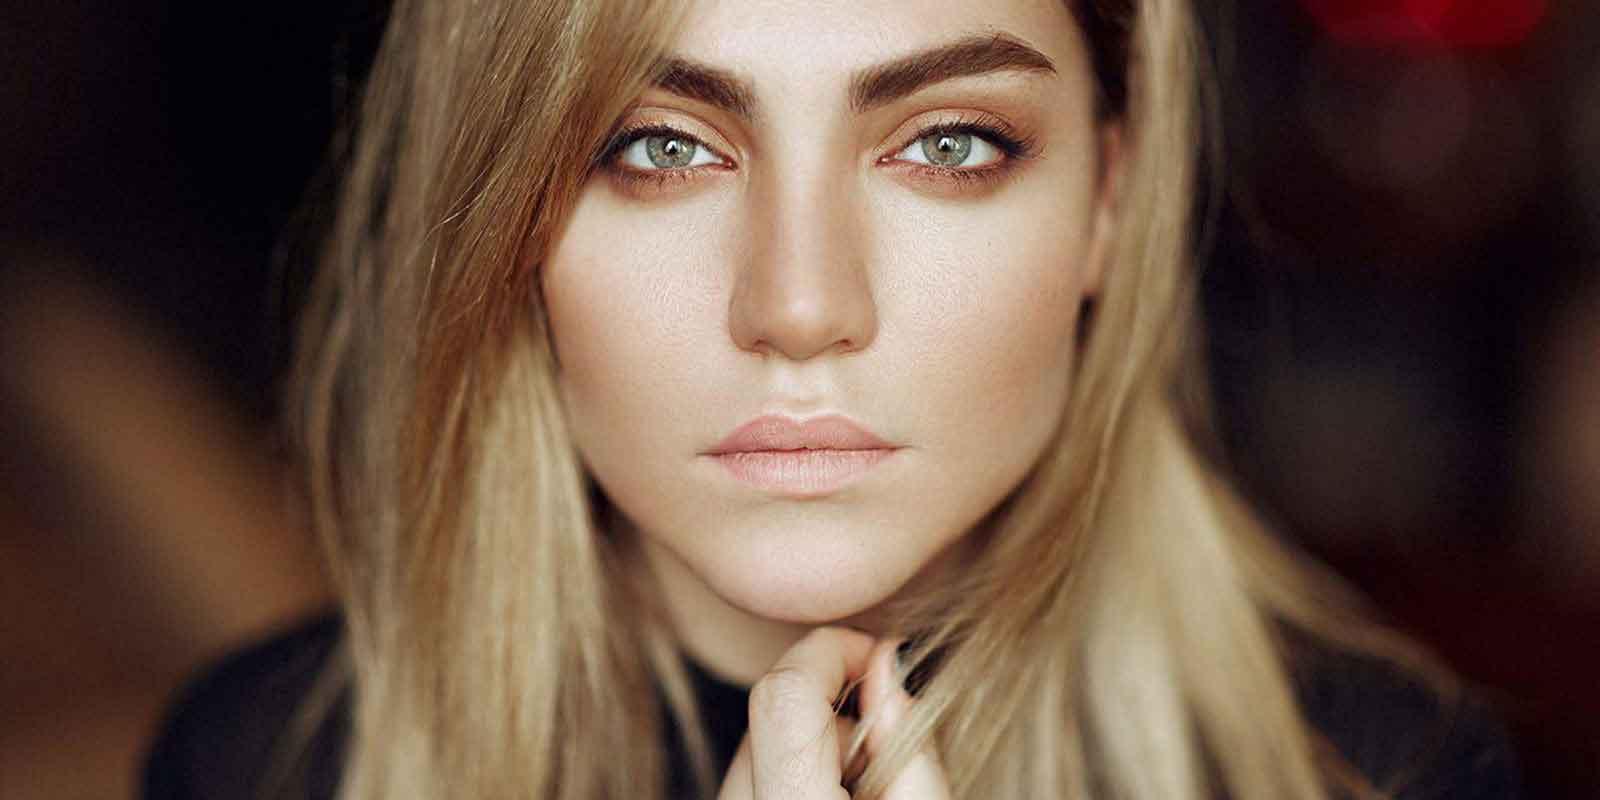 کلینیک زیبایی ساعی- خدمات کاشت مو کاشت ابرو زاویه سازی صورت لیزر موهای زائد